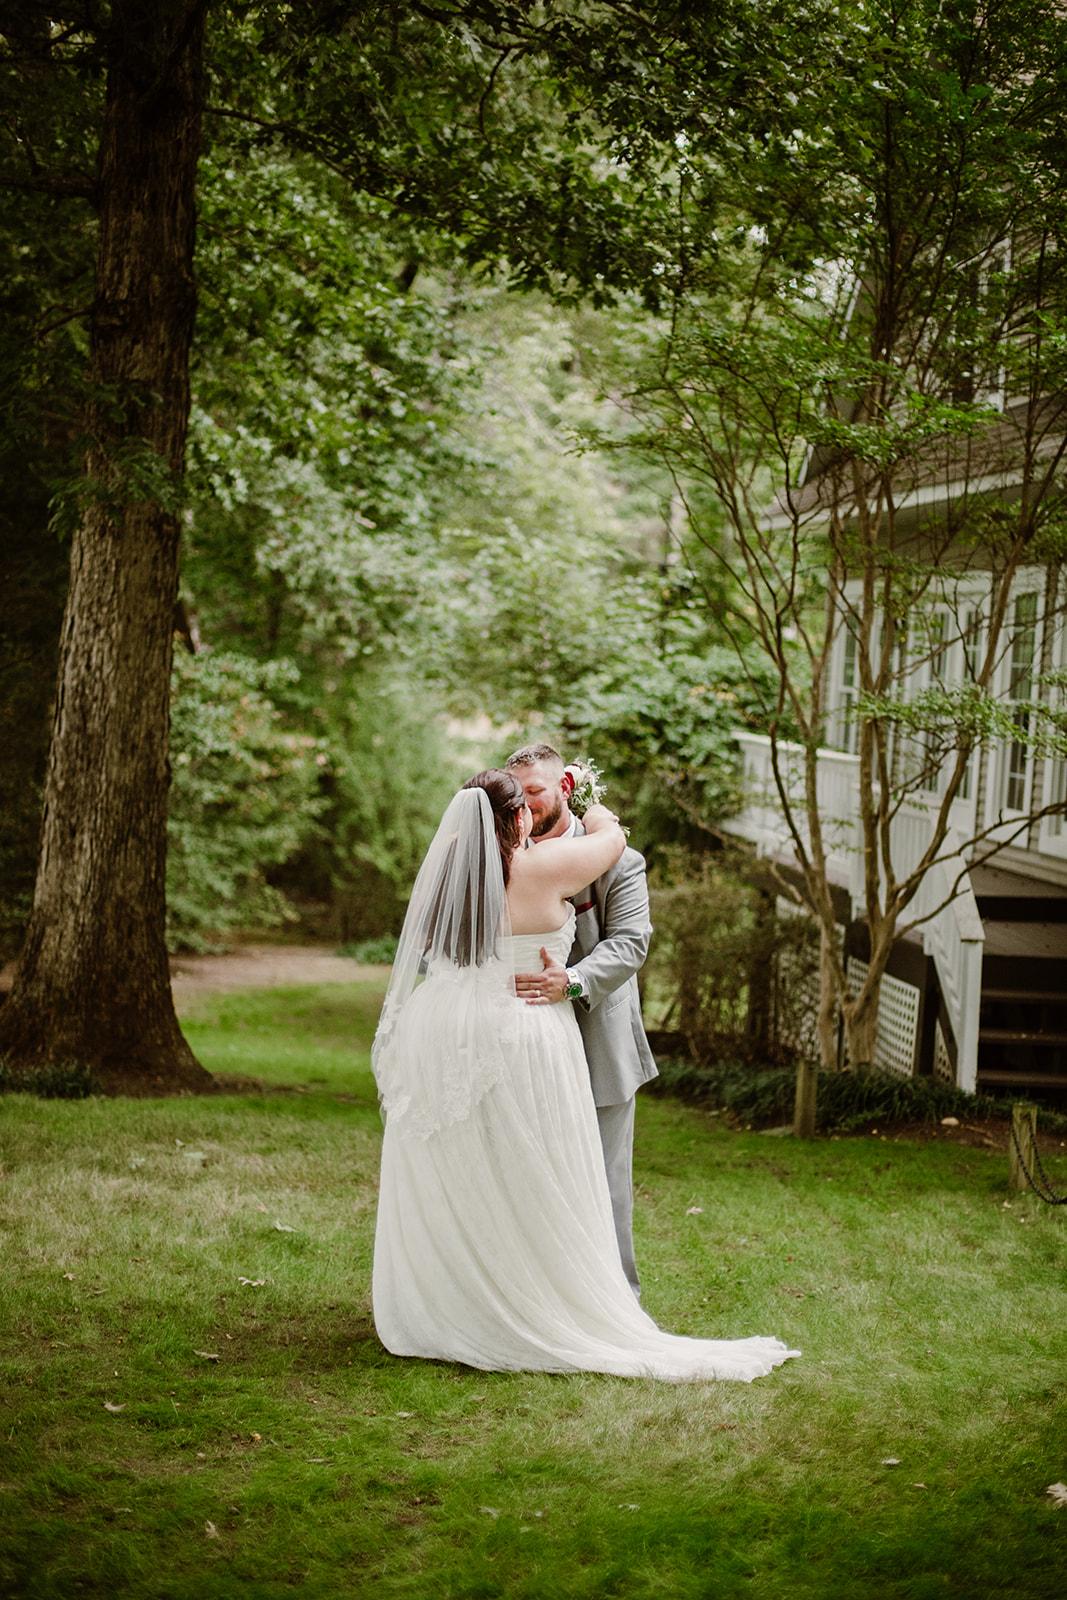 SarahMattozziPhotography-NicoleChris-GlenGardens-Portraits-16.jpg